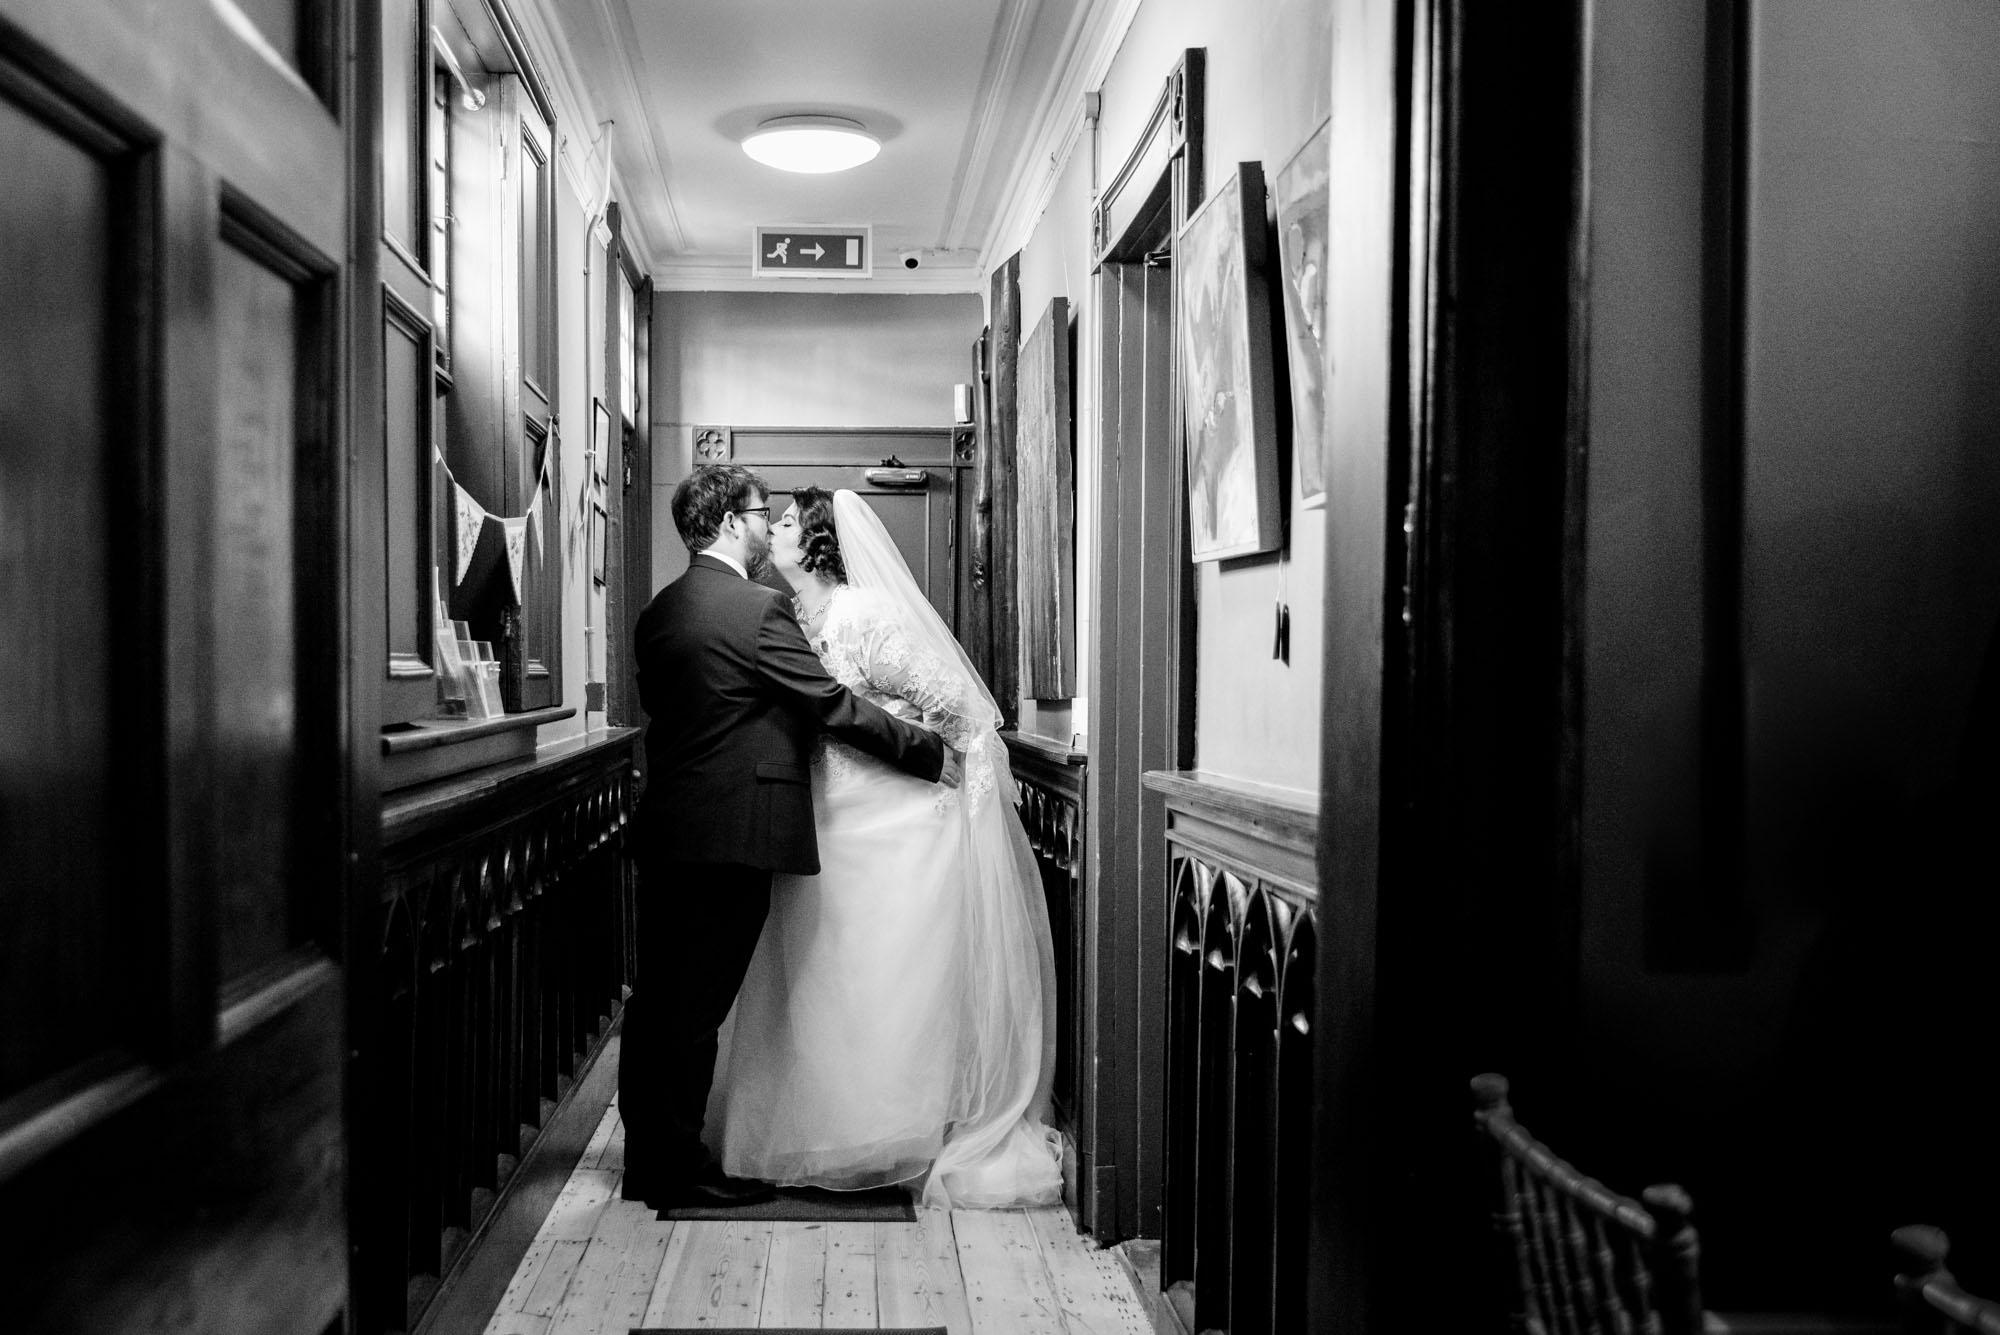 Kissing in the corridor